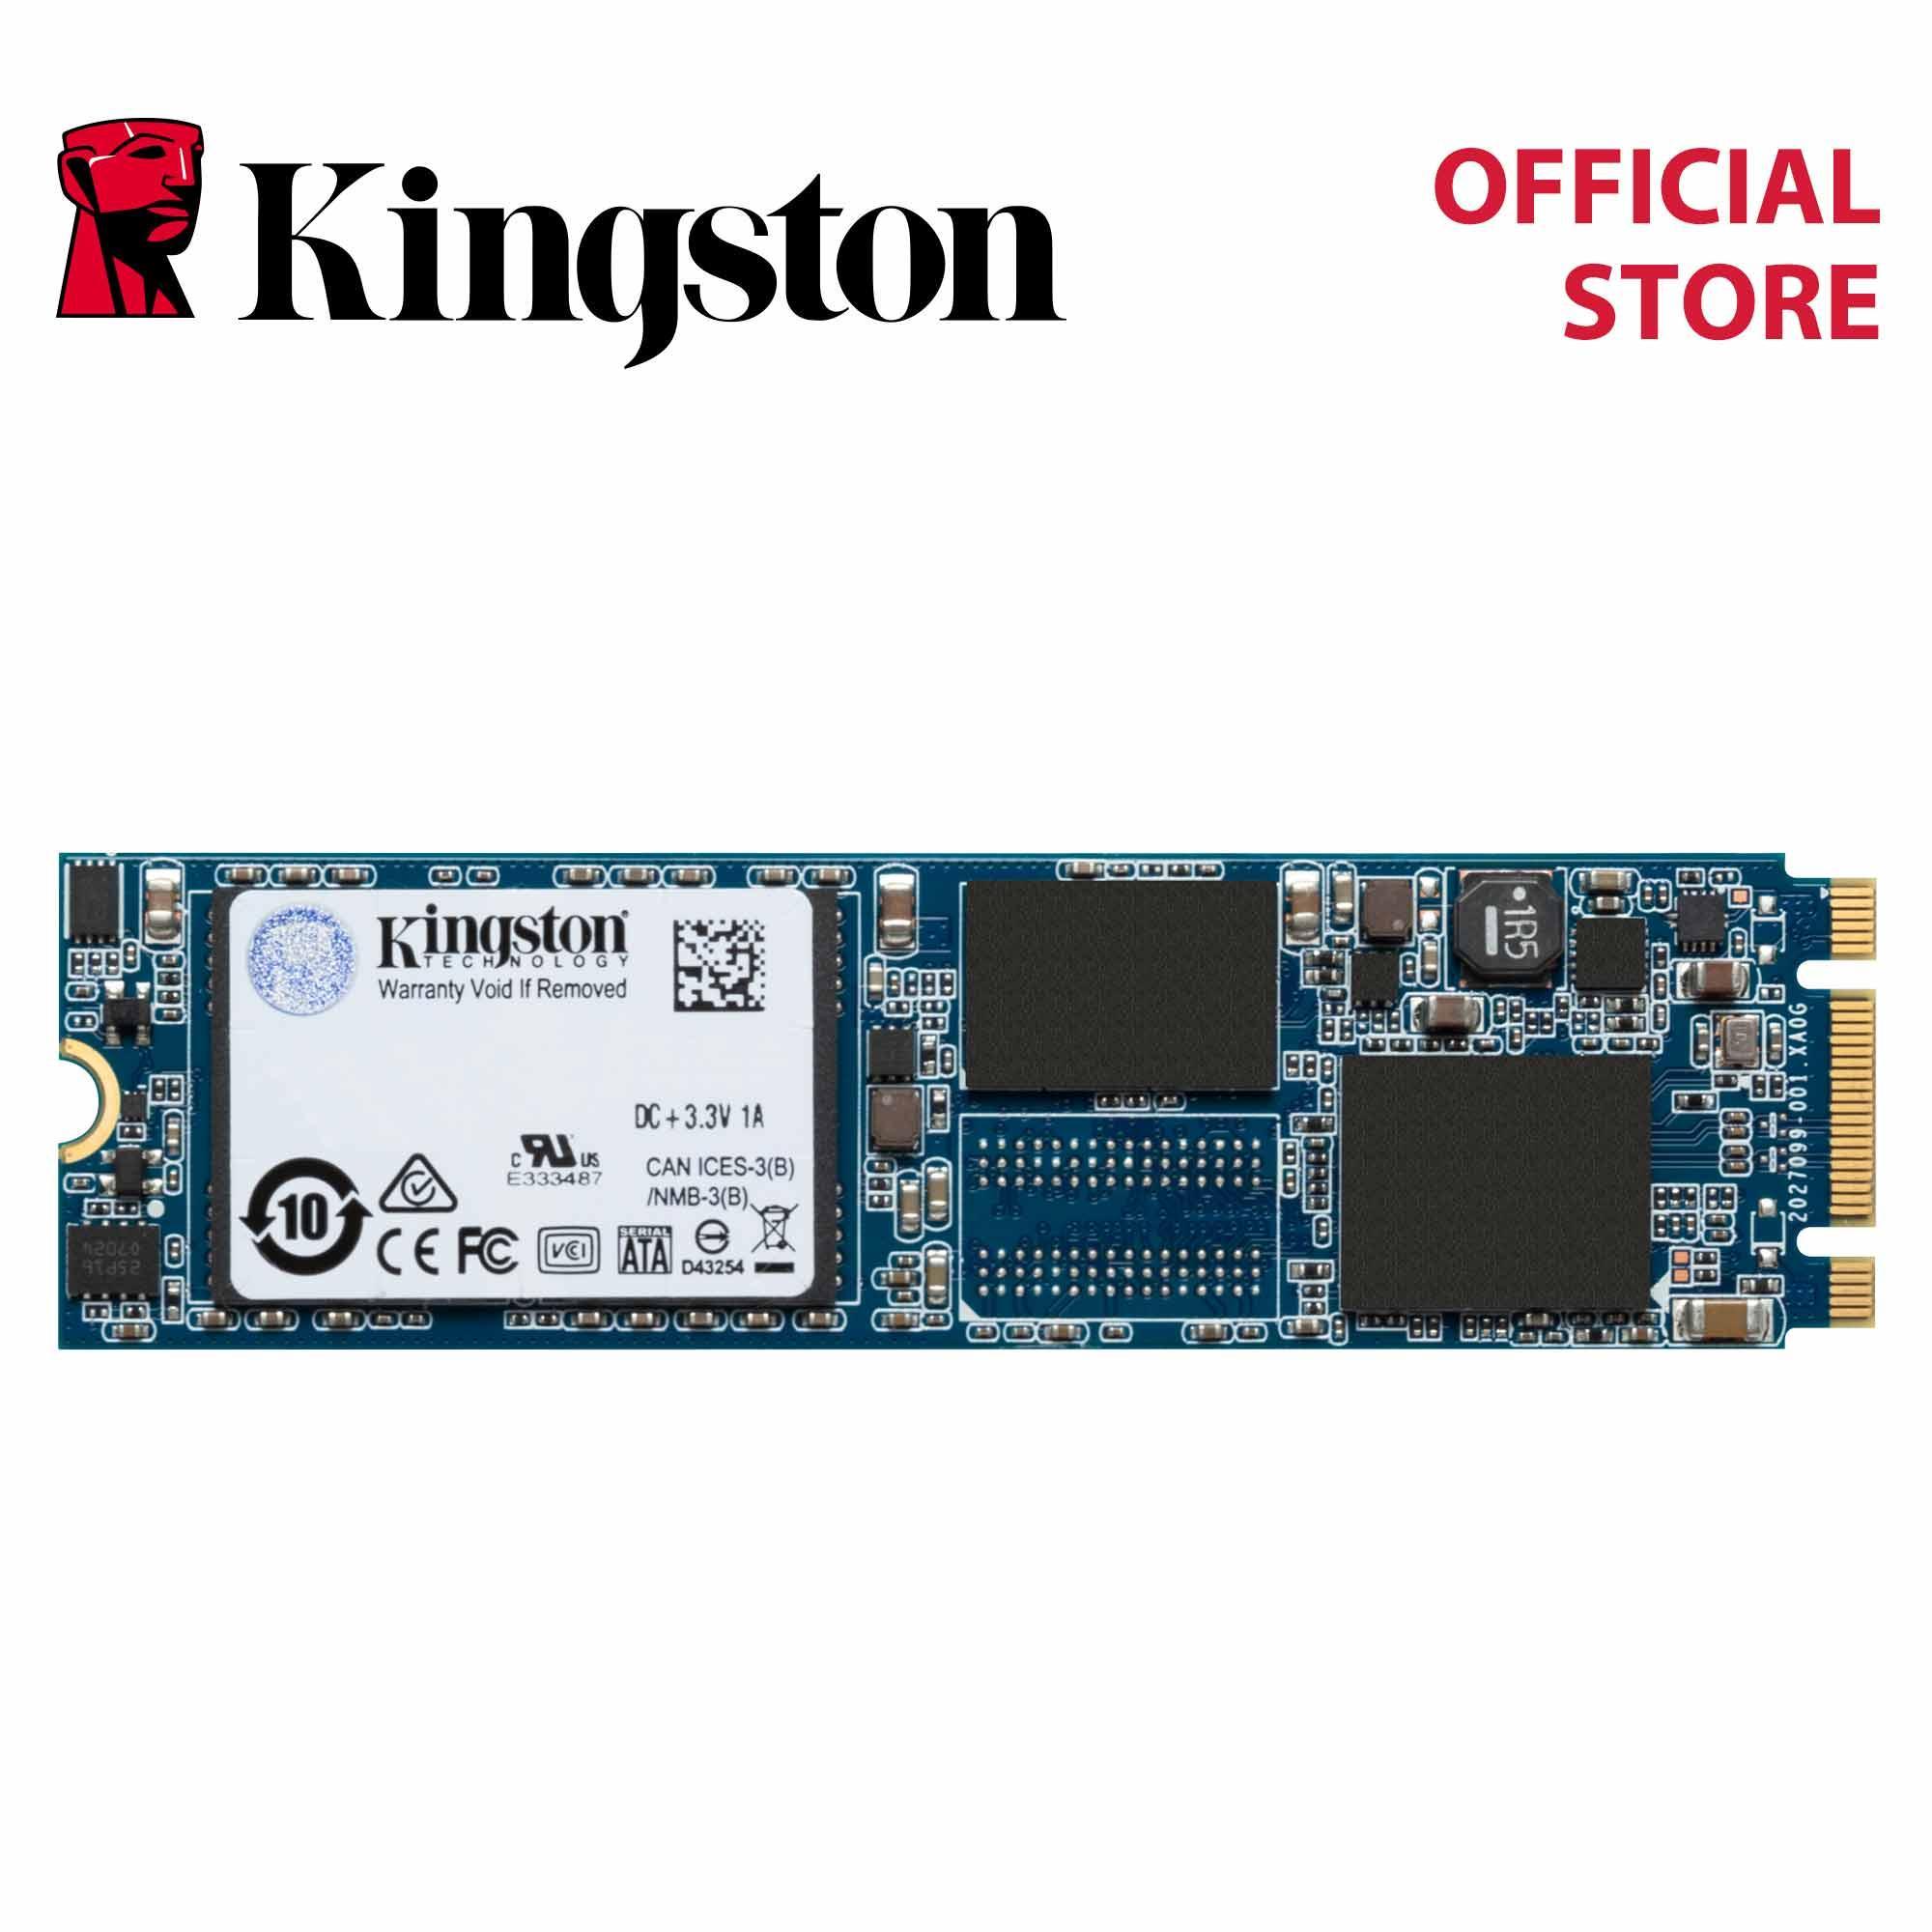 Philippines Bestsellers Kingston Uv500 120gb Msata Suv500ms 120g Ssd Vgen 120 Gb M2 2280 Suv500m8